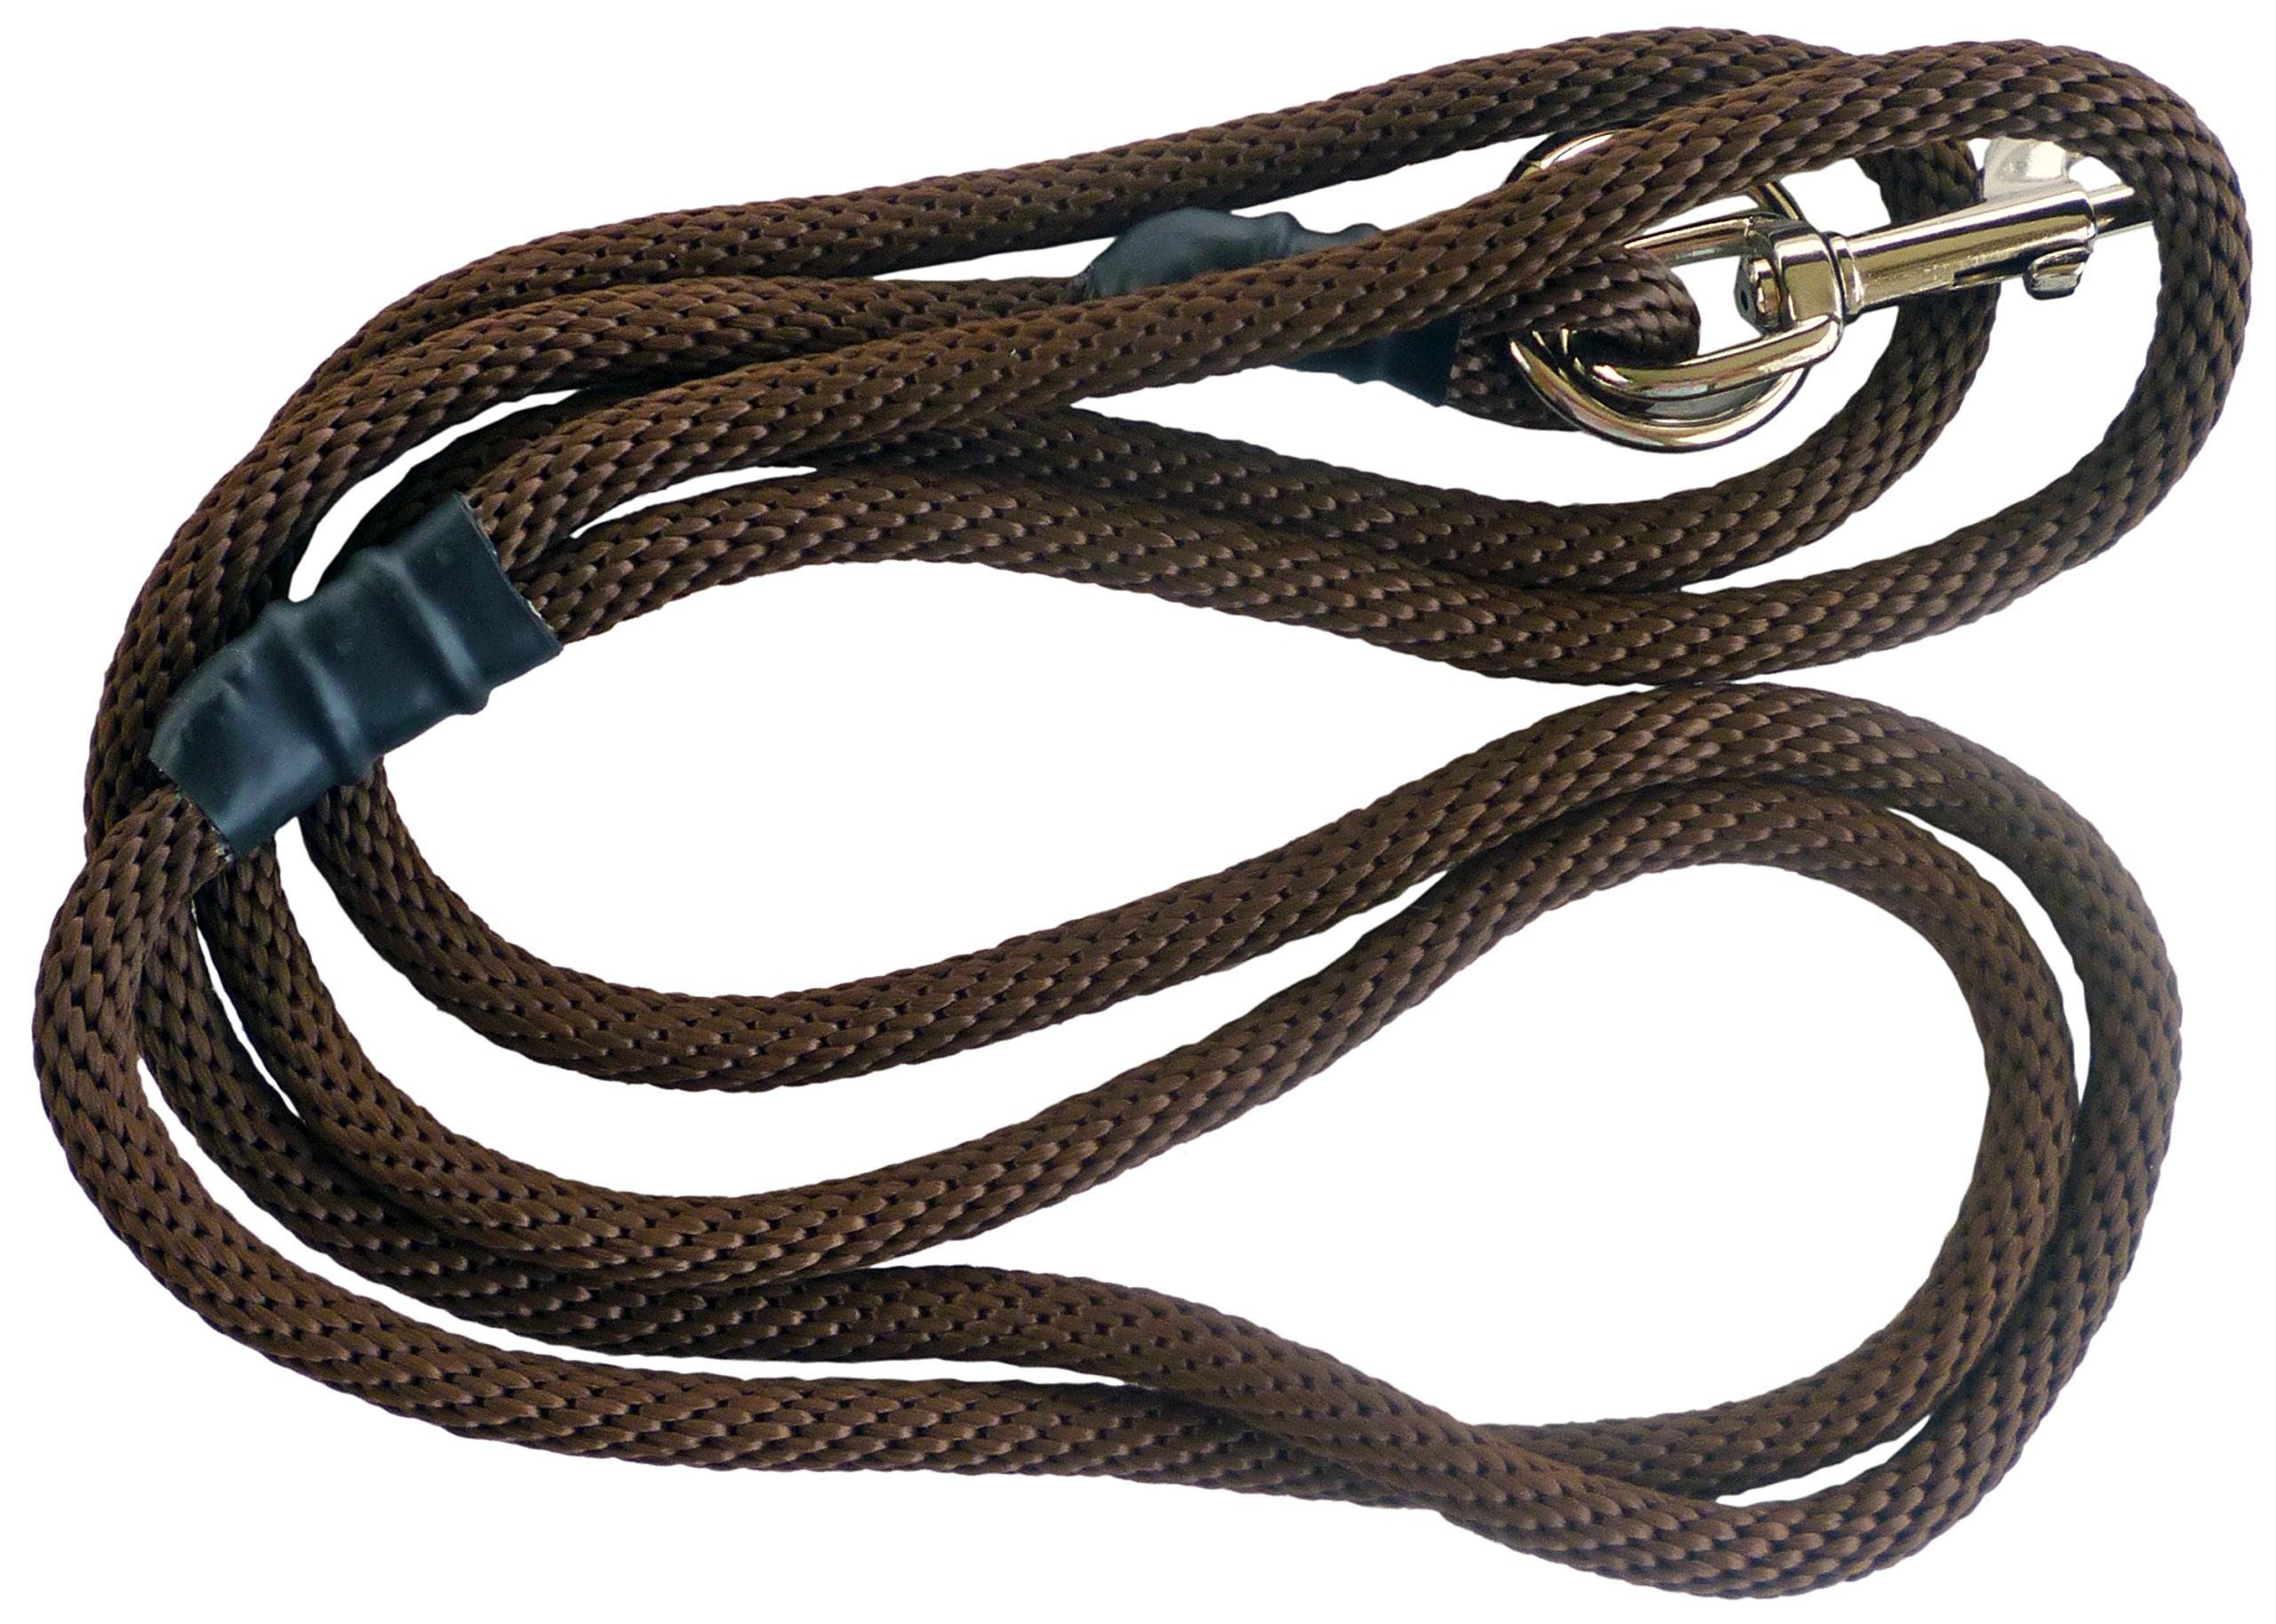 Weiss Walkie No Pull Dog Leash & Training Leash - Brown